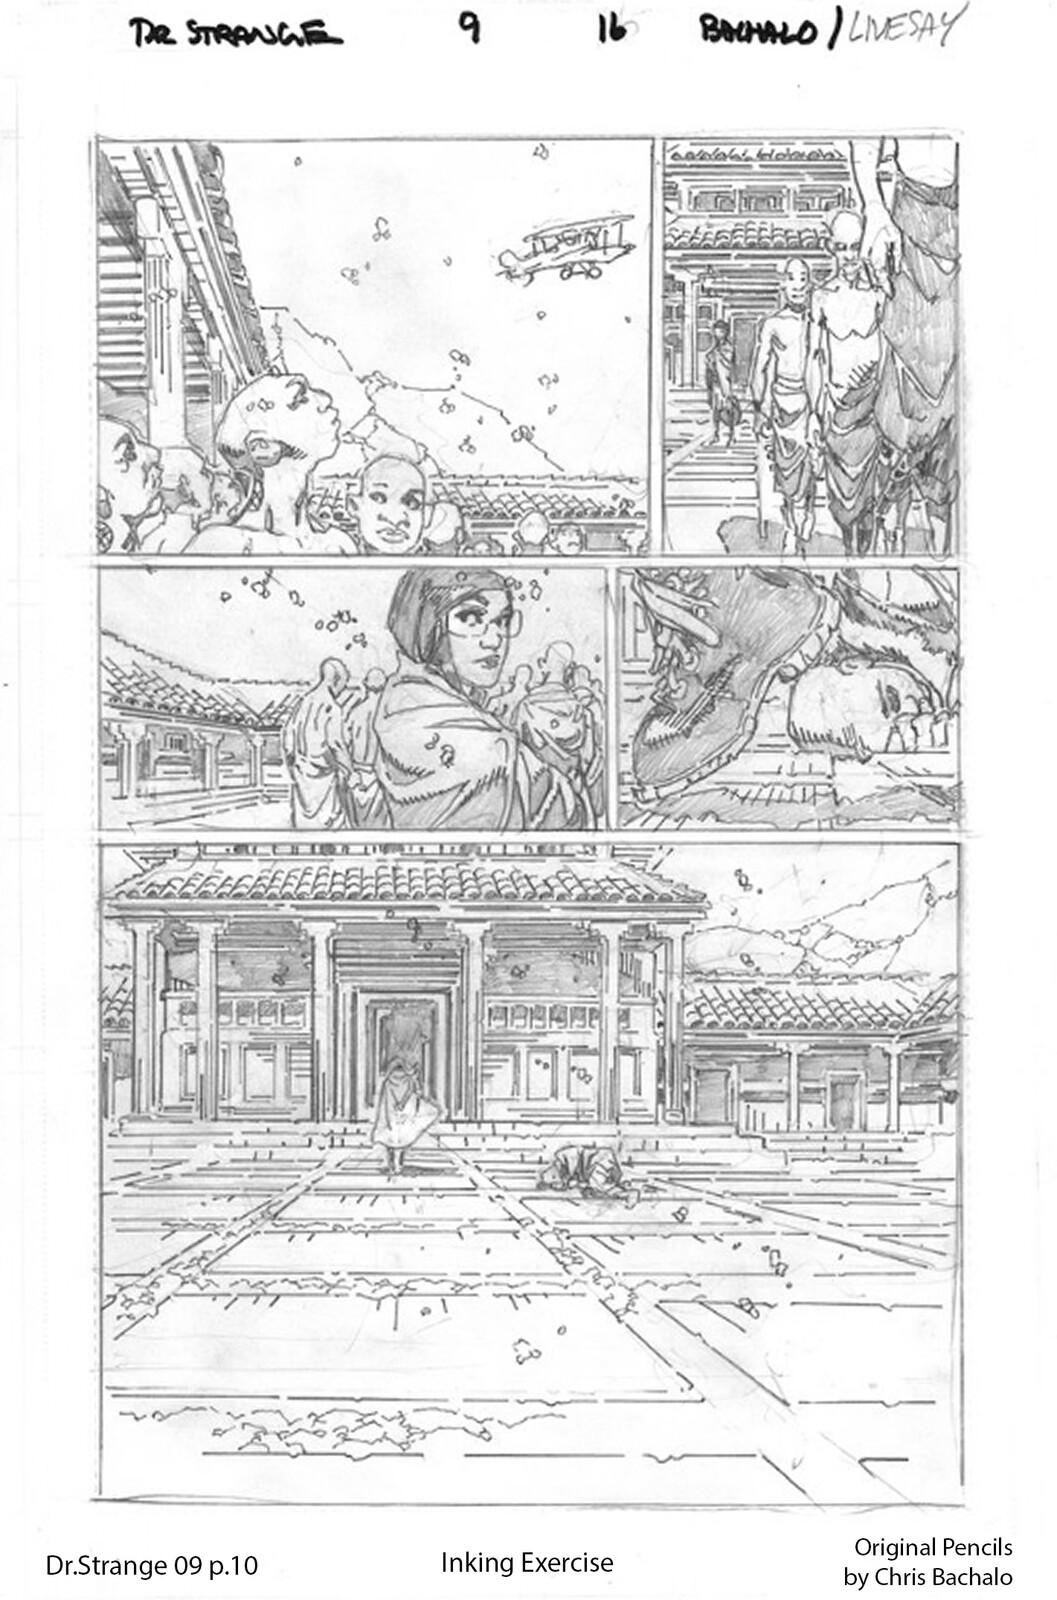 Dr.Strange #09 - page 10 Original pencils by Chris Bachalo